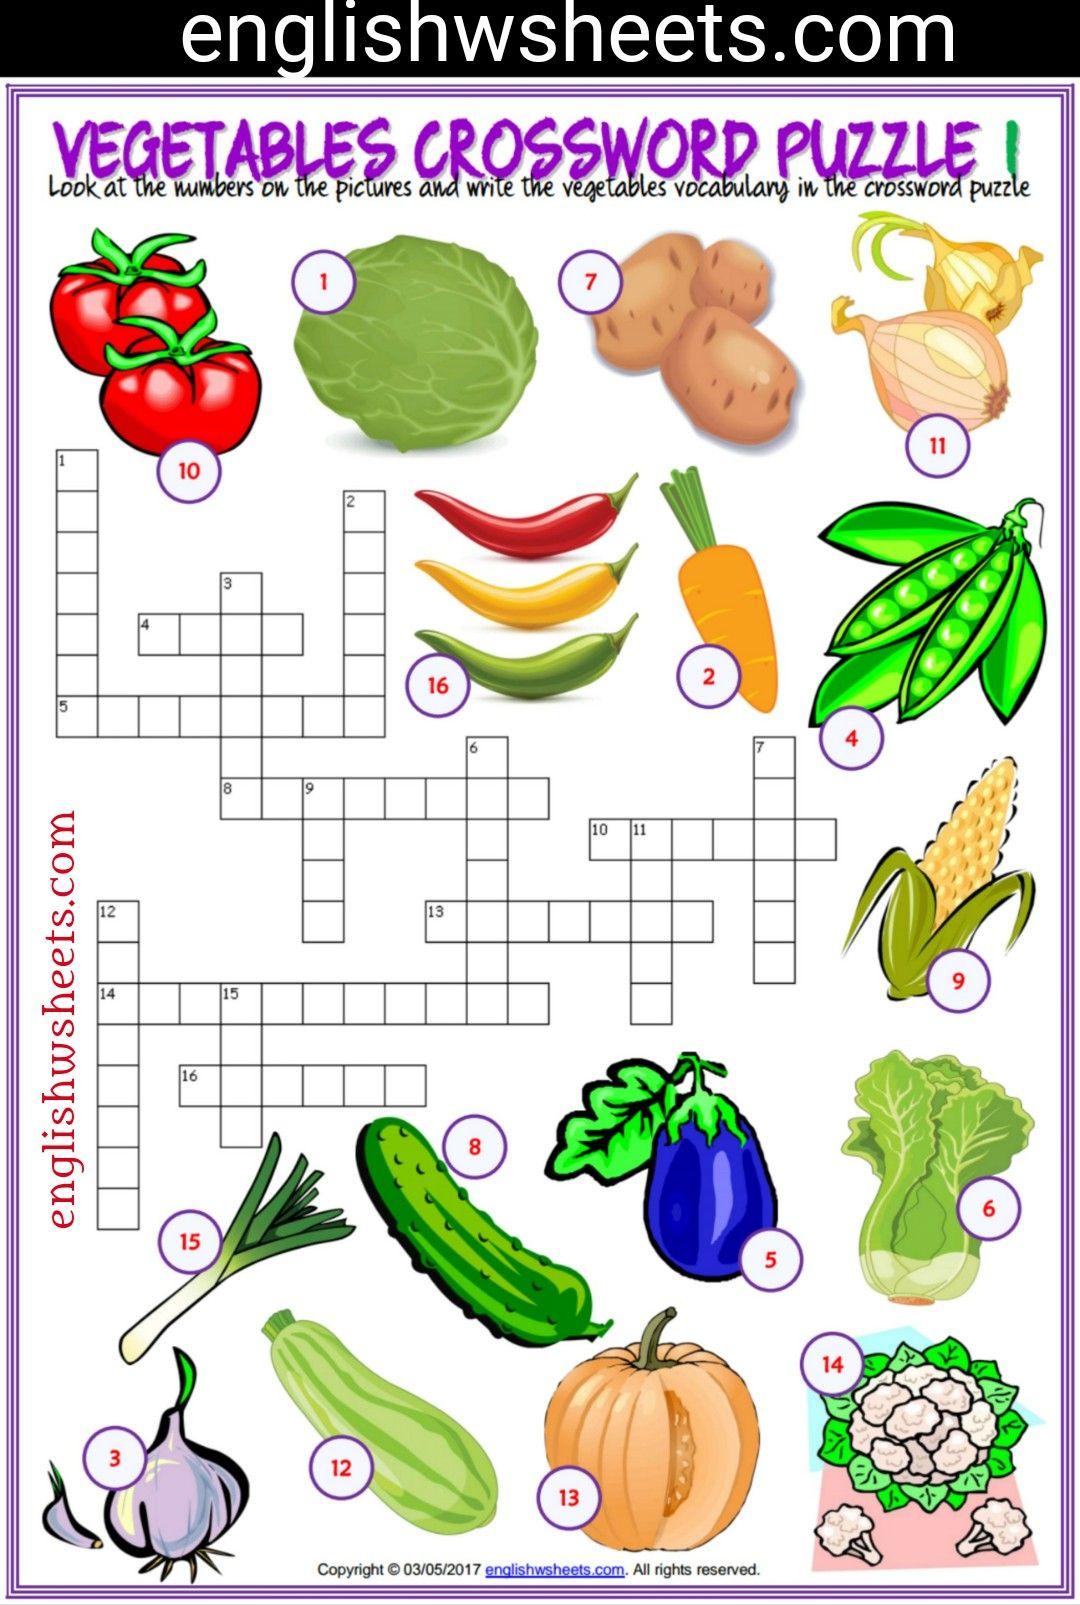 Vegetables Esl Printable Crossword Puzzle Worksheets For Kids - Printable Crossword Puzzles Esl